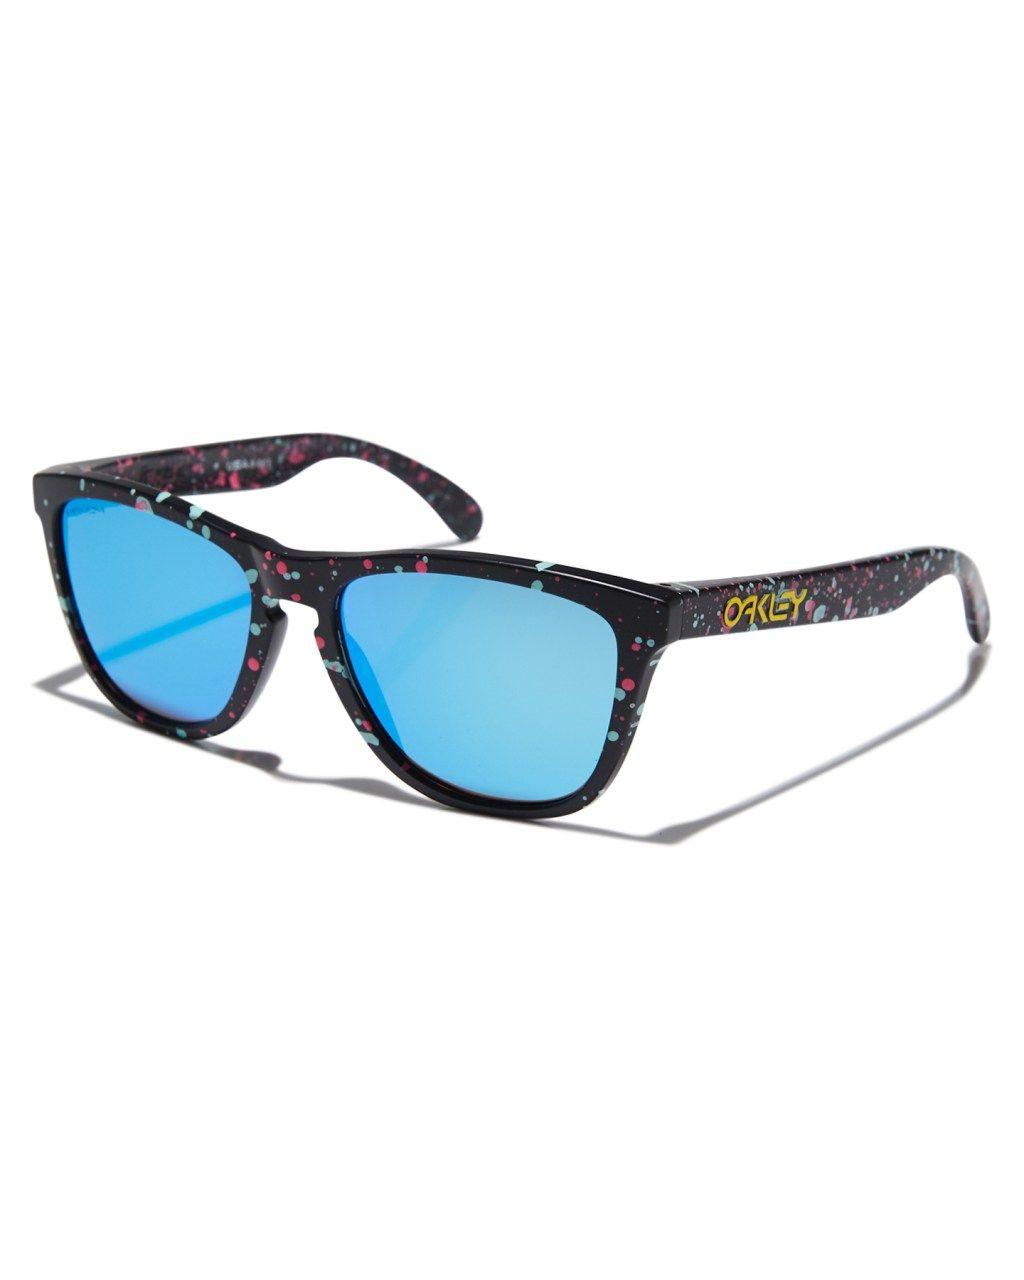 49ce20346314d Oakley Frogskins Sunglasses Splatter Black Prizm Mens sunglasses Size Oakley  Frogskins